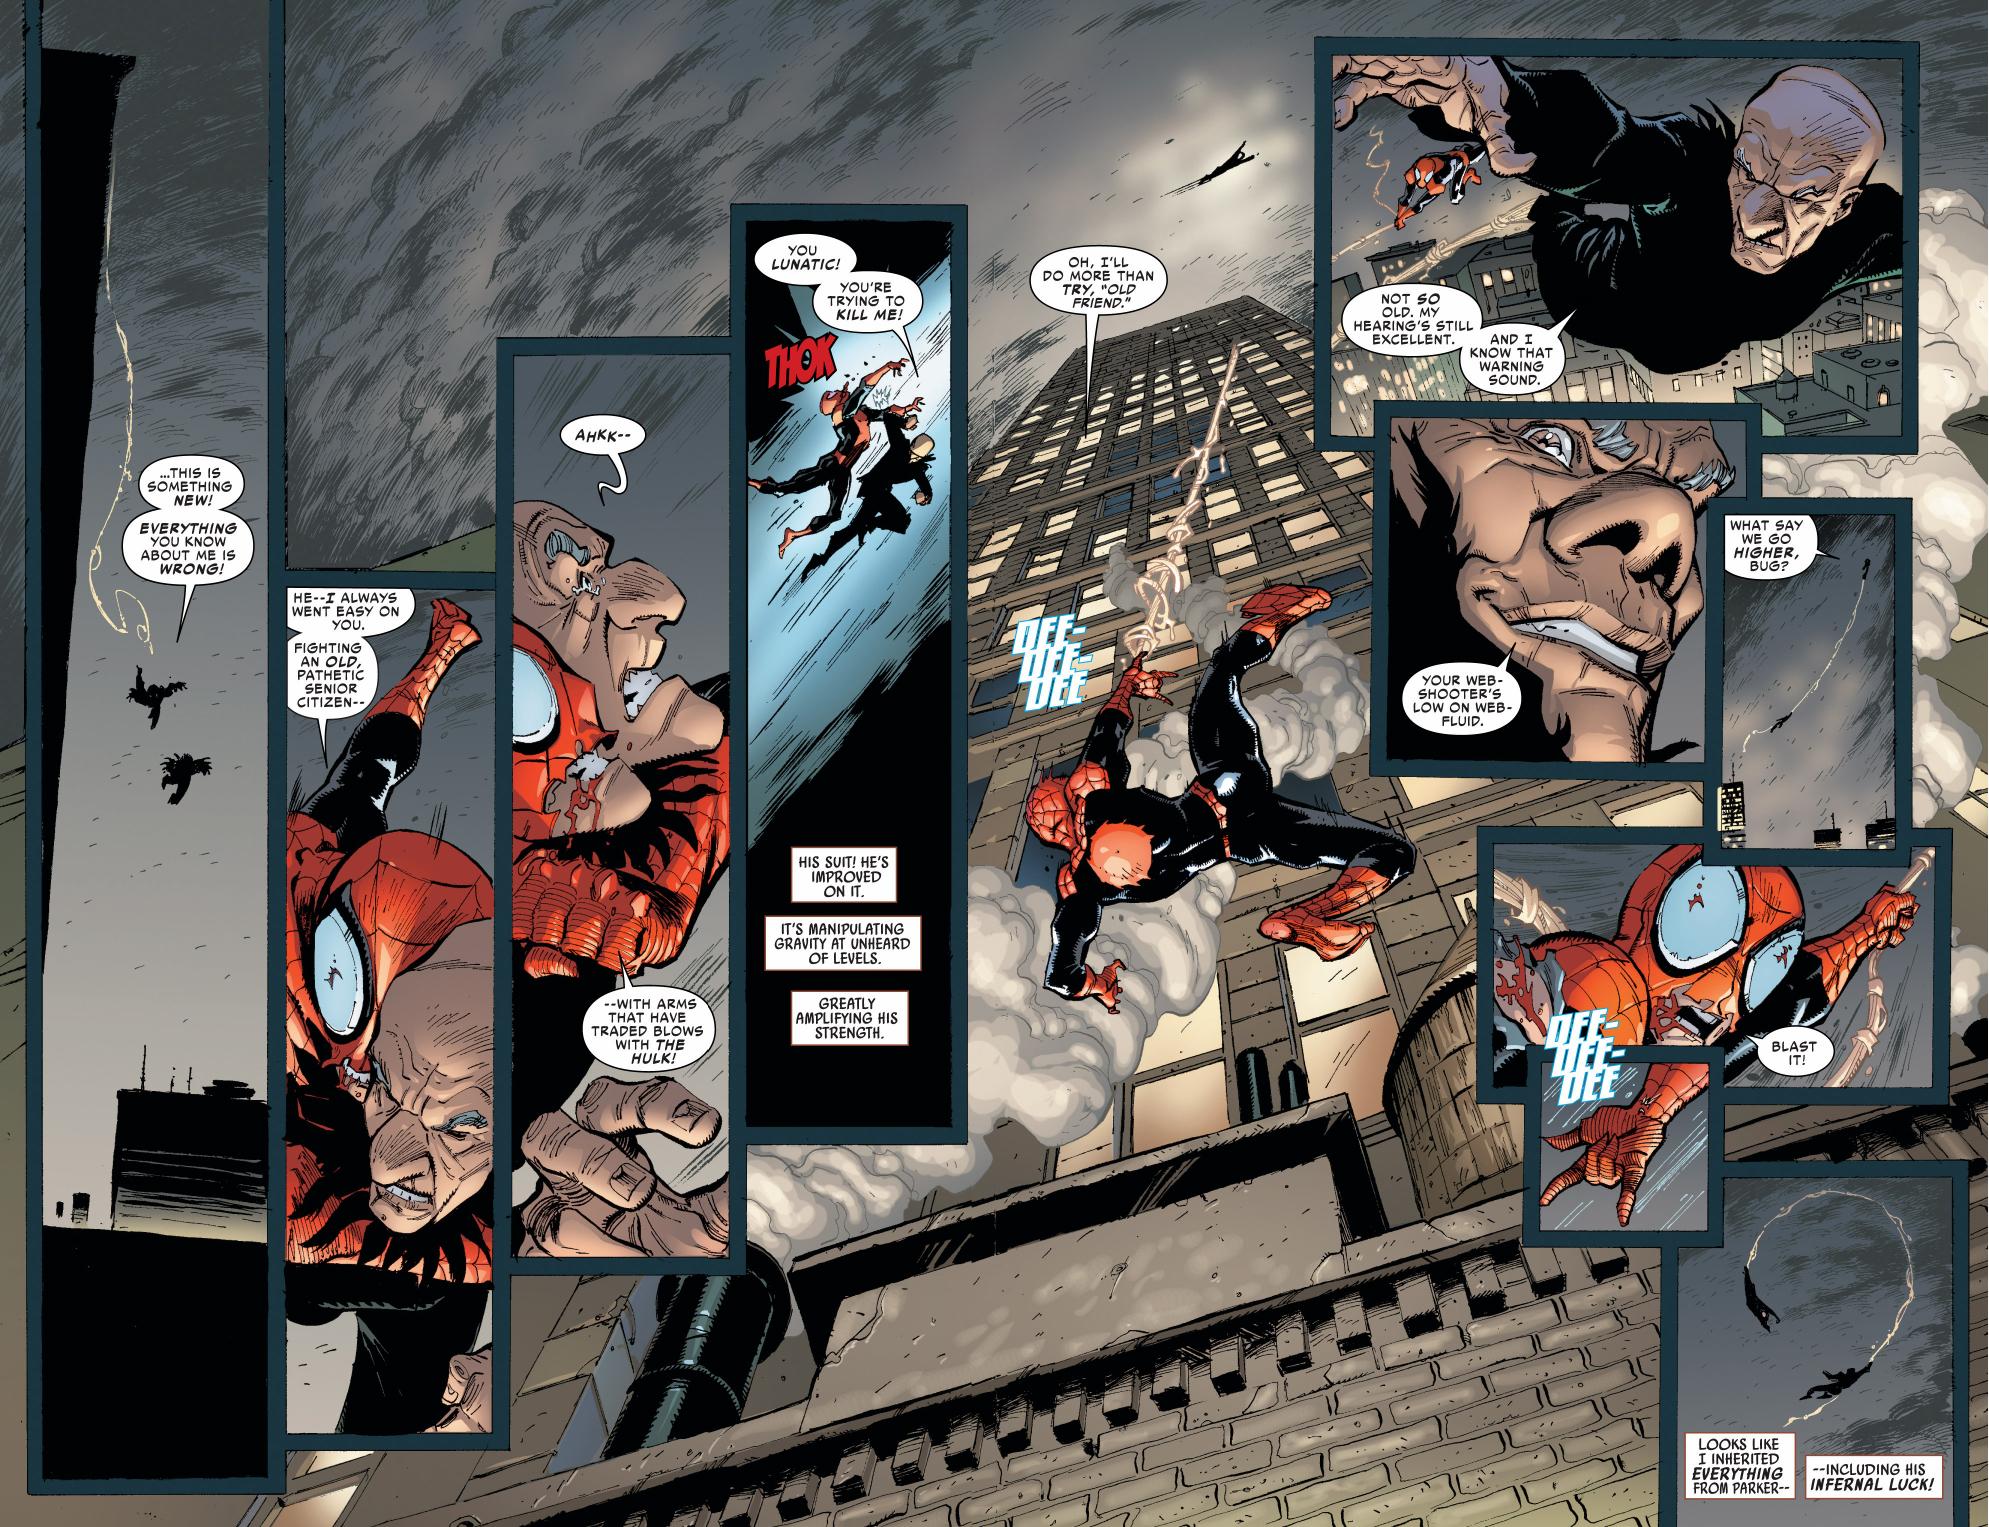 superior spider-man vs the vulture